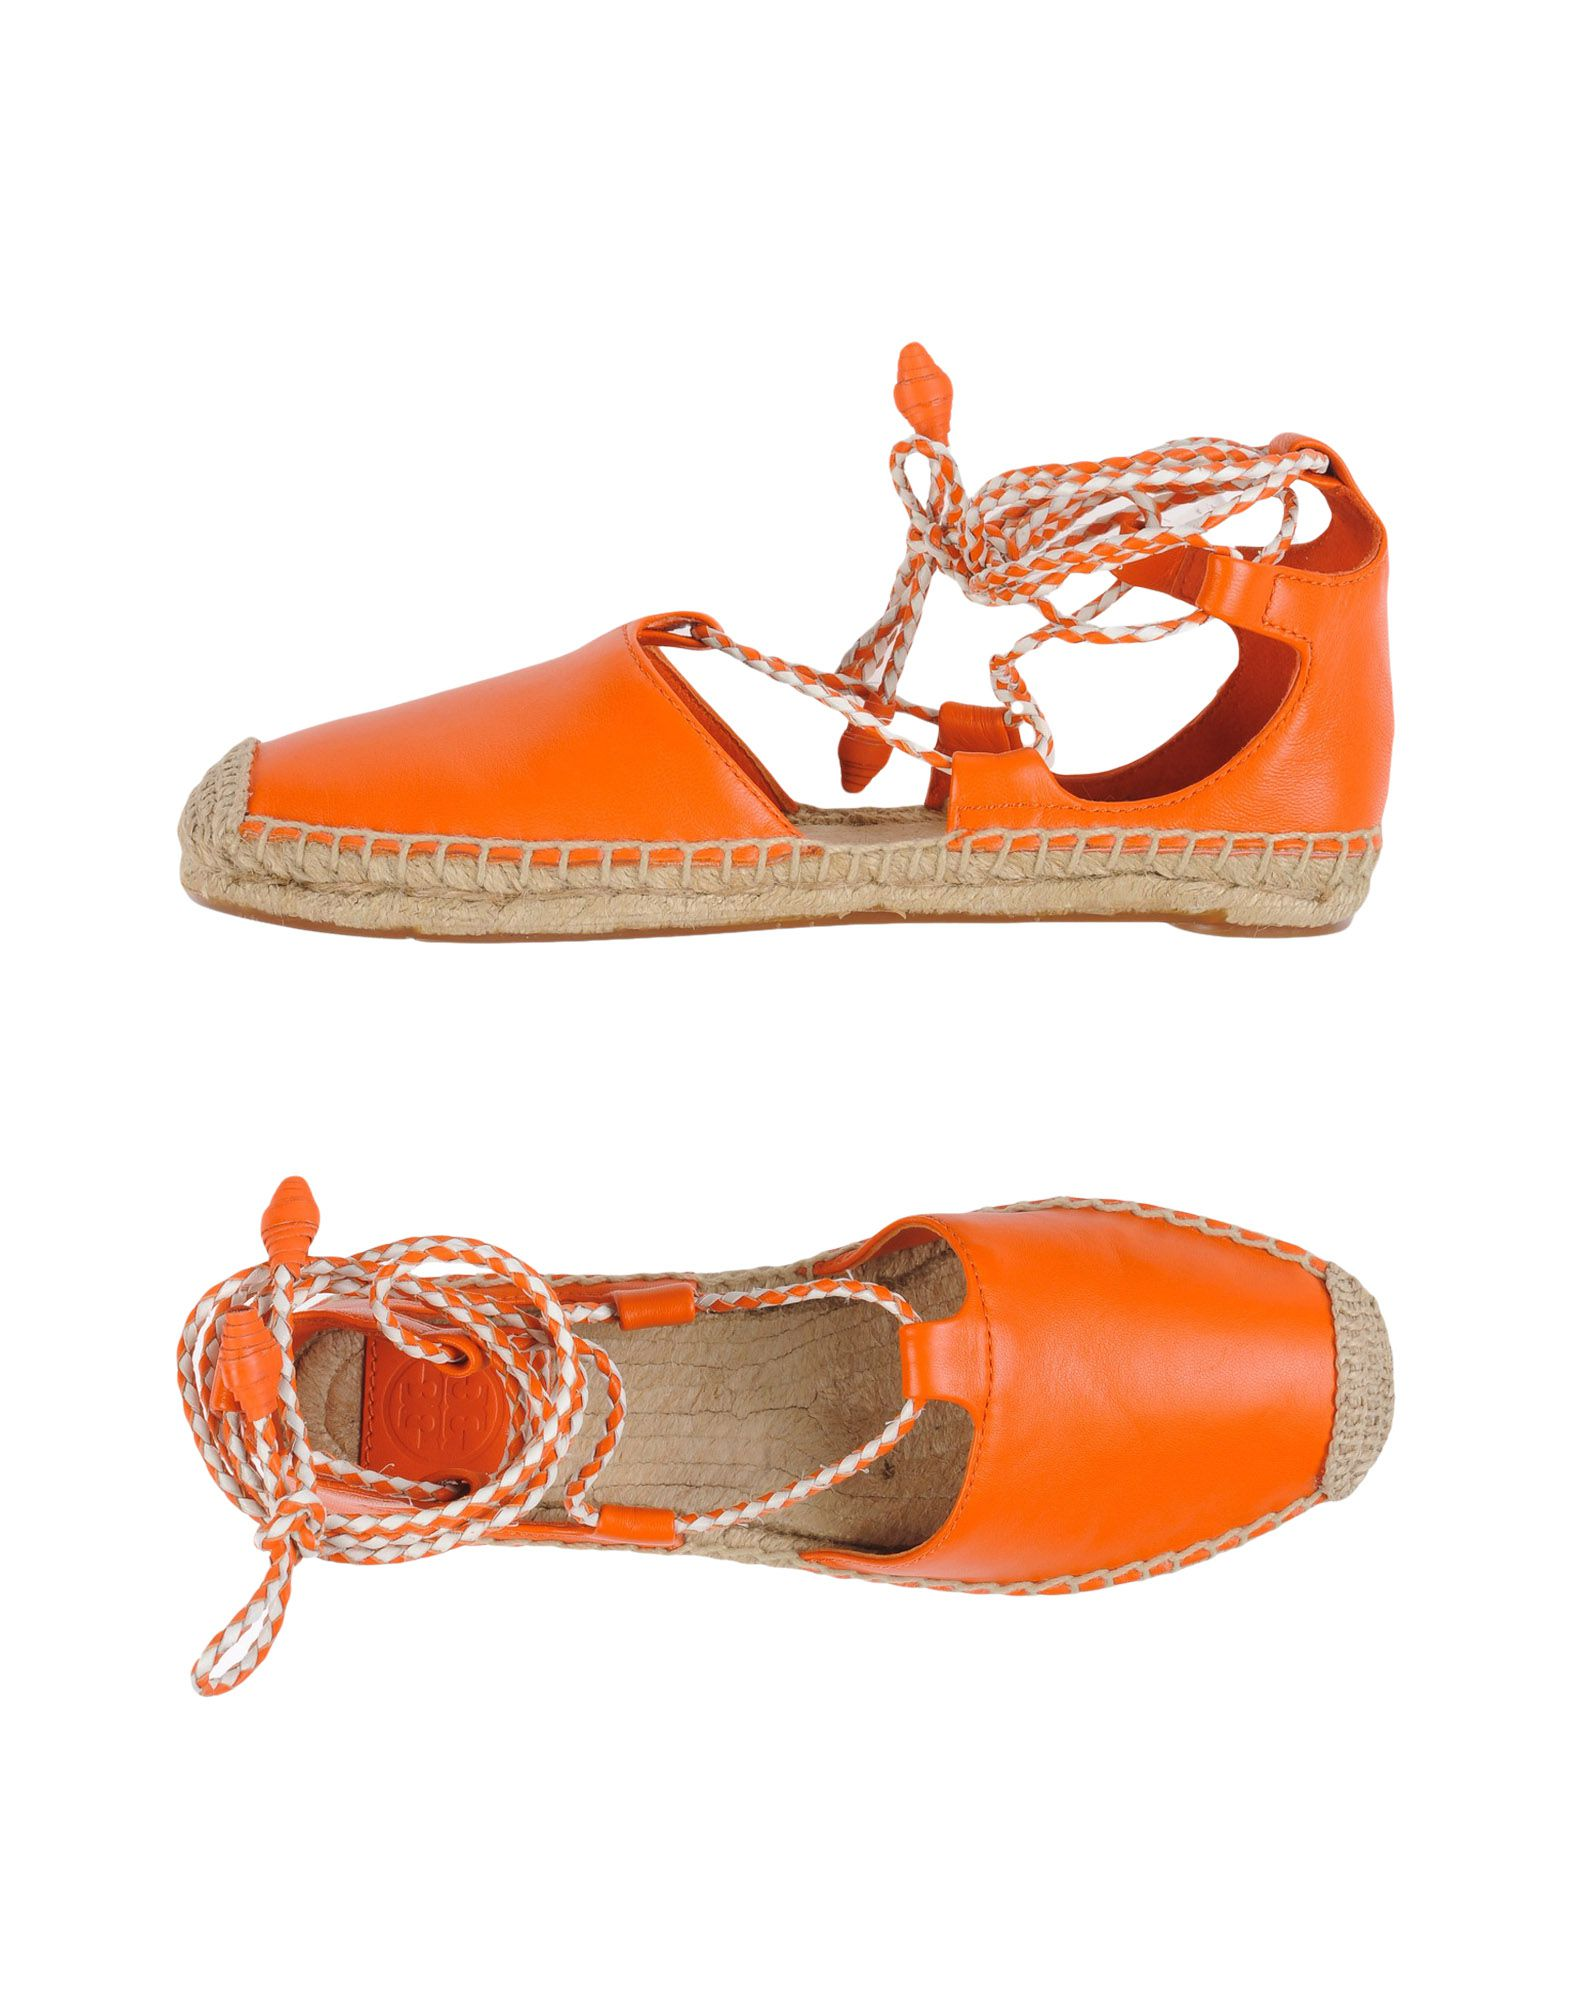 Tory Burch 11162118QGGut Espadrilles Damen  11162118QGGut Burch aussehende strapazierfähige Schuhe 369db2